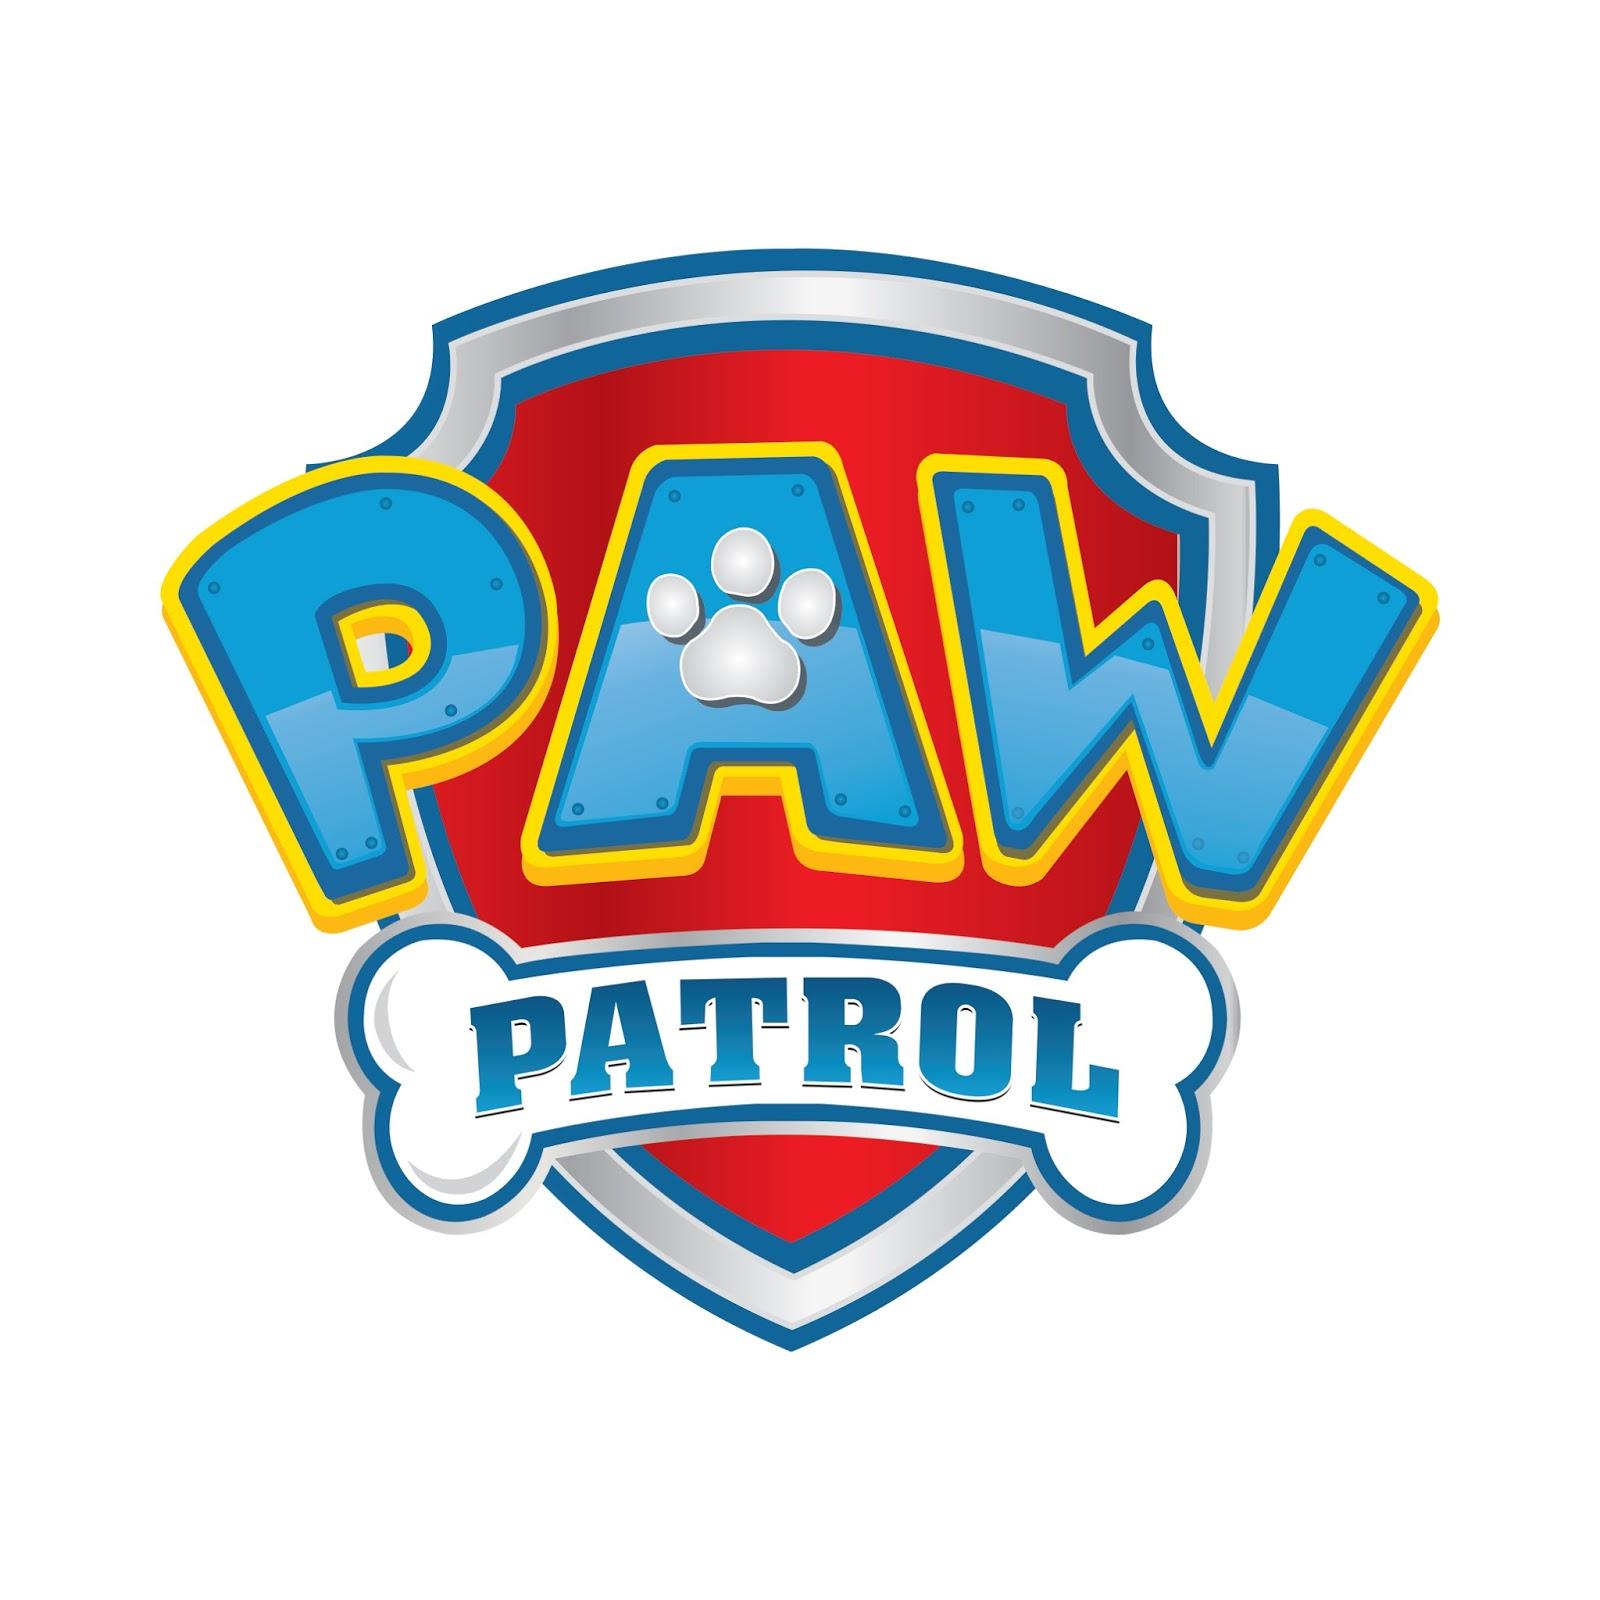 Paw Patrol Badge Printable - Bilscreen